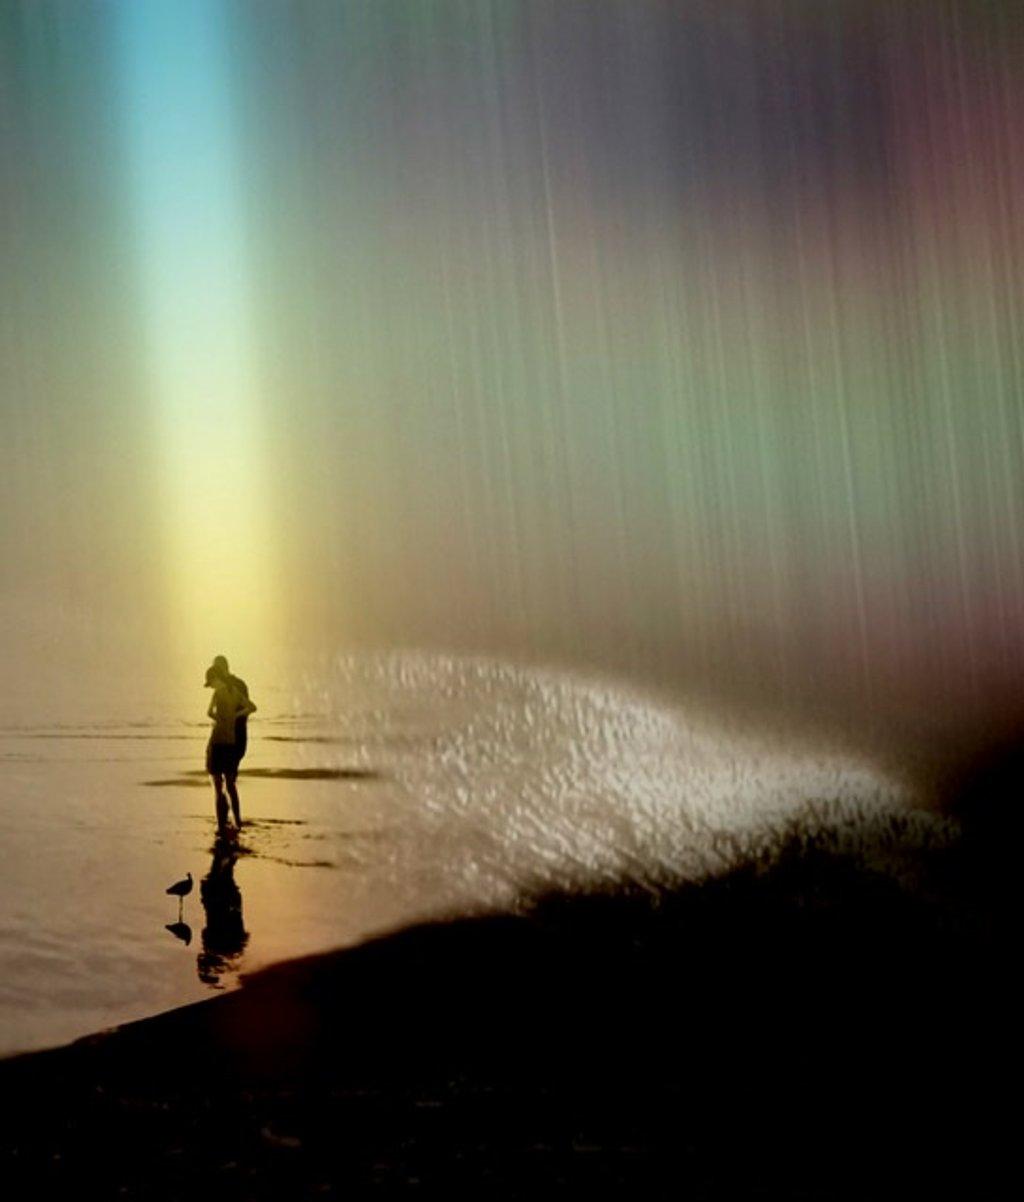 Sea of Desire by joemuli